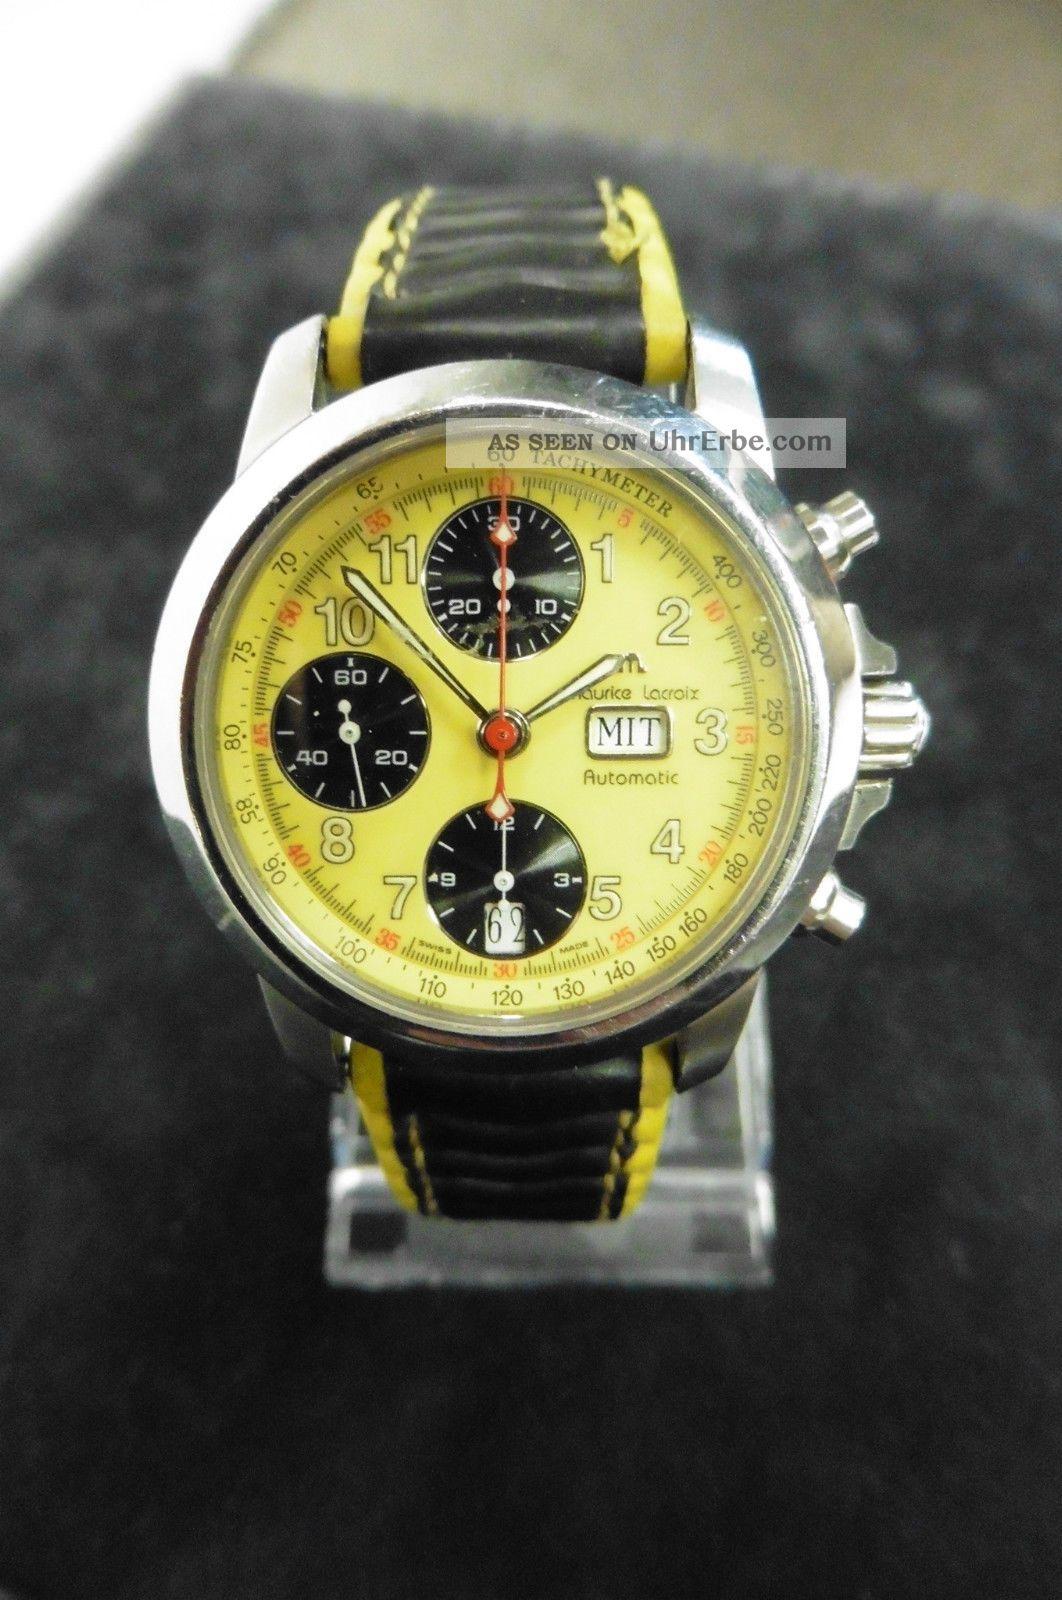 Maurice Lacroix 39721 Chronometer Dau Hau Herrenuhr Klassisch Uhr Automatik Armbanduhren Bild